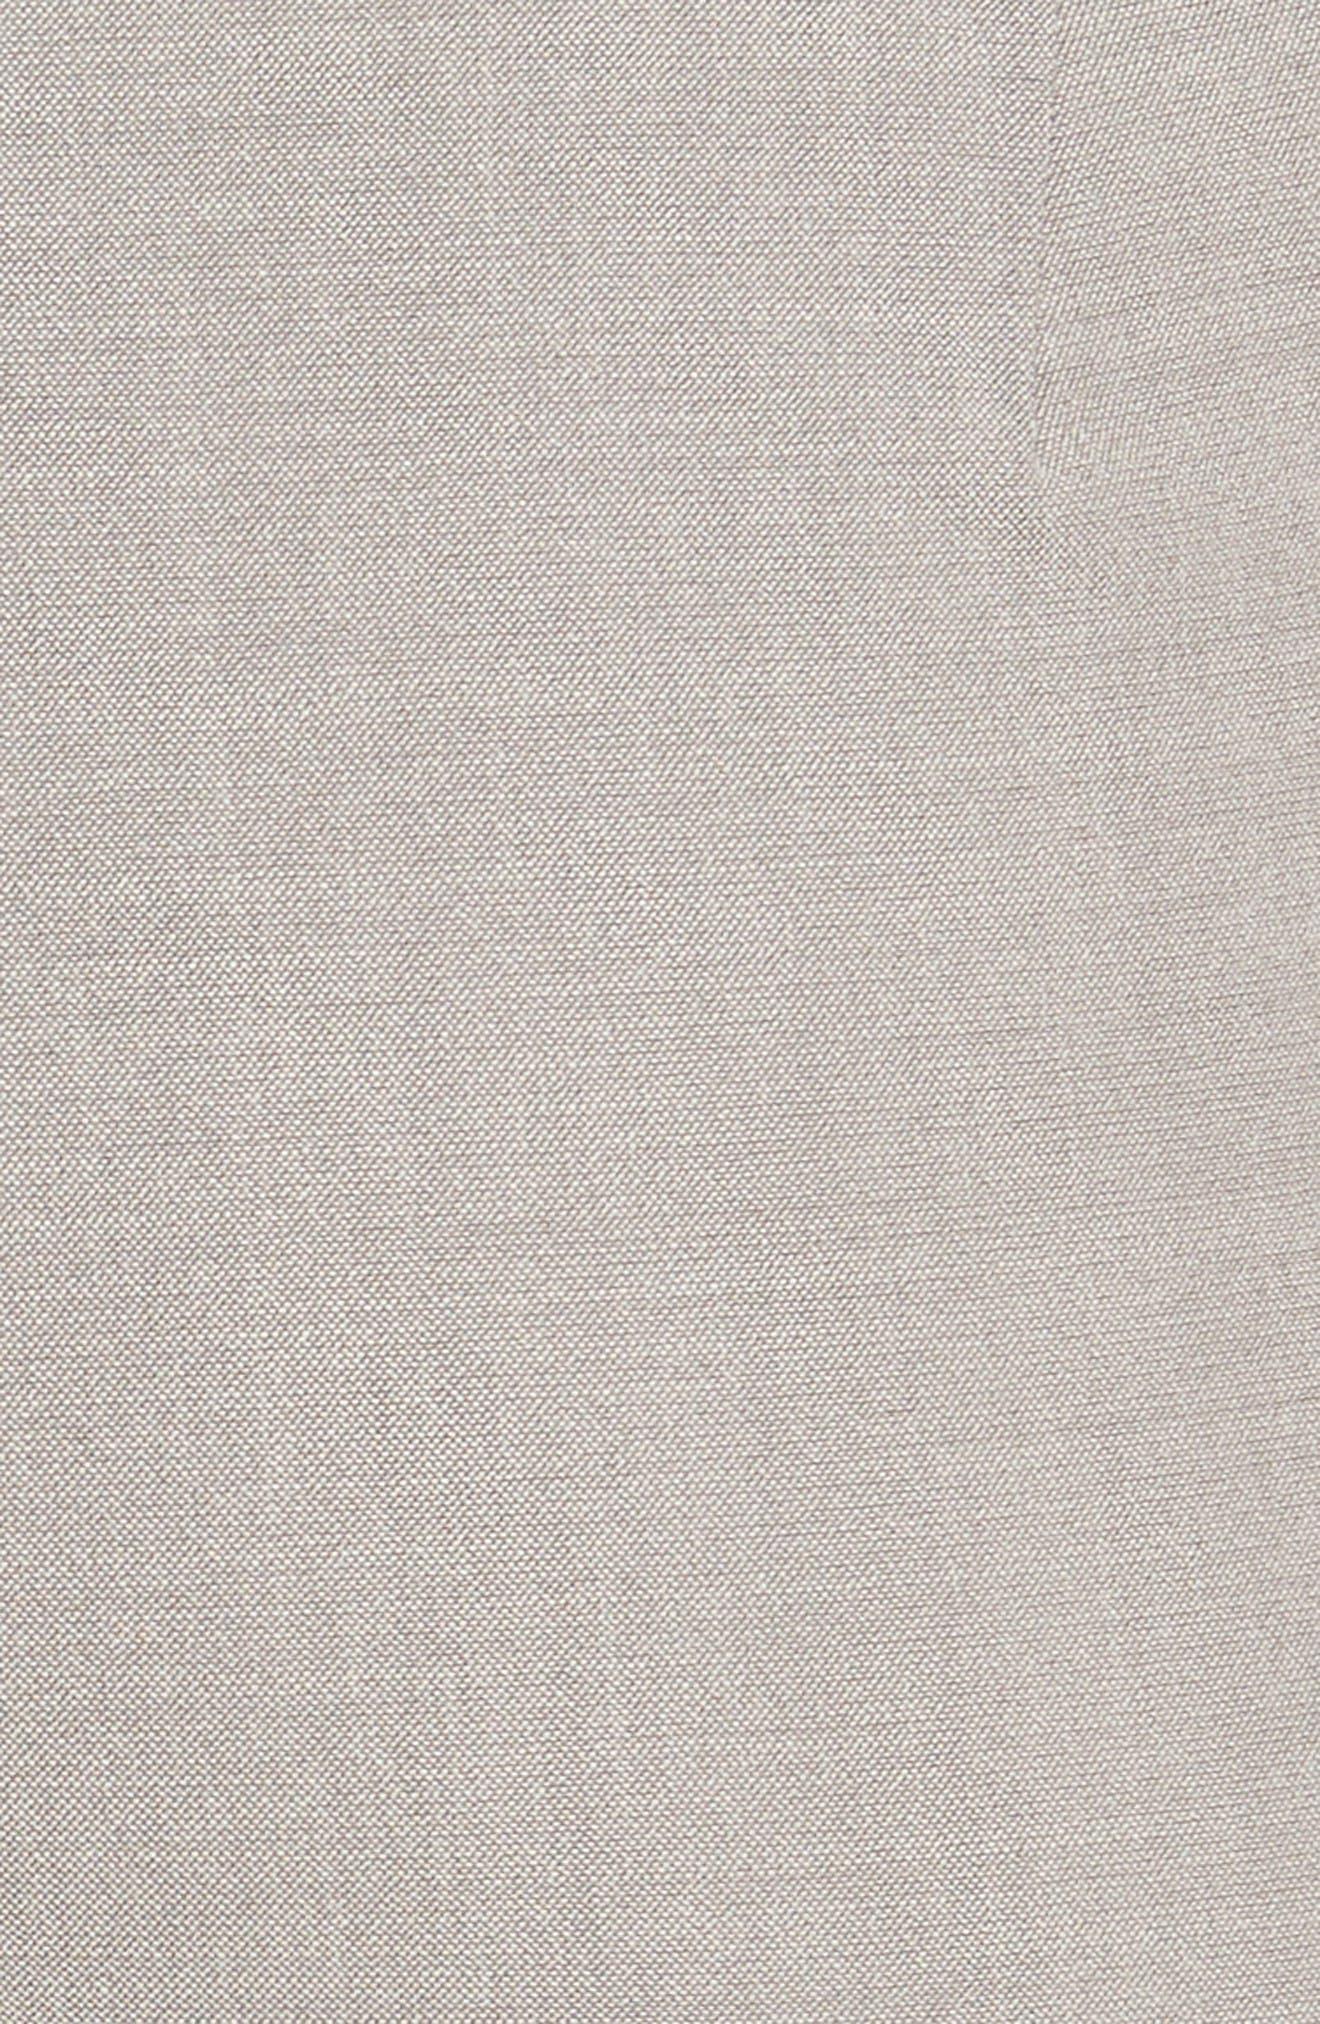 Manhattan Slim Pants,                             Alternate thumbnail 6, color,                             Feather Grey Melange